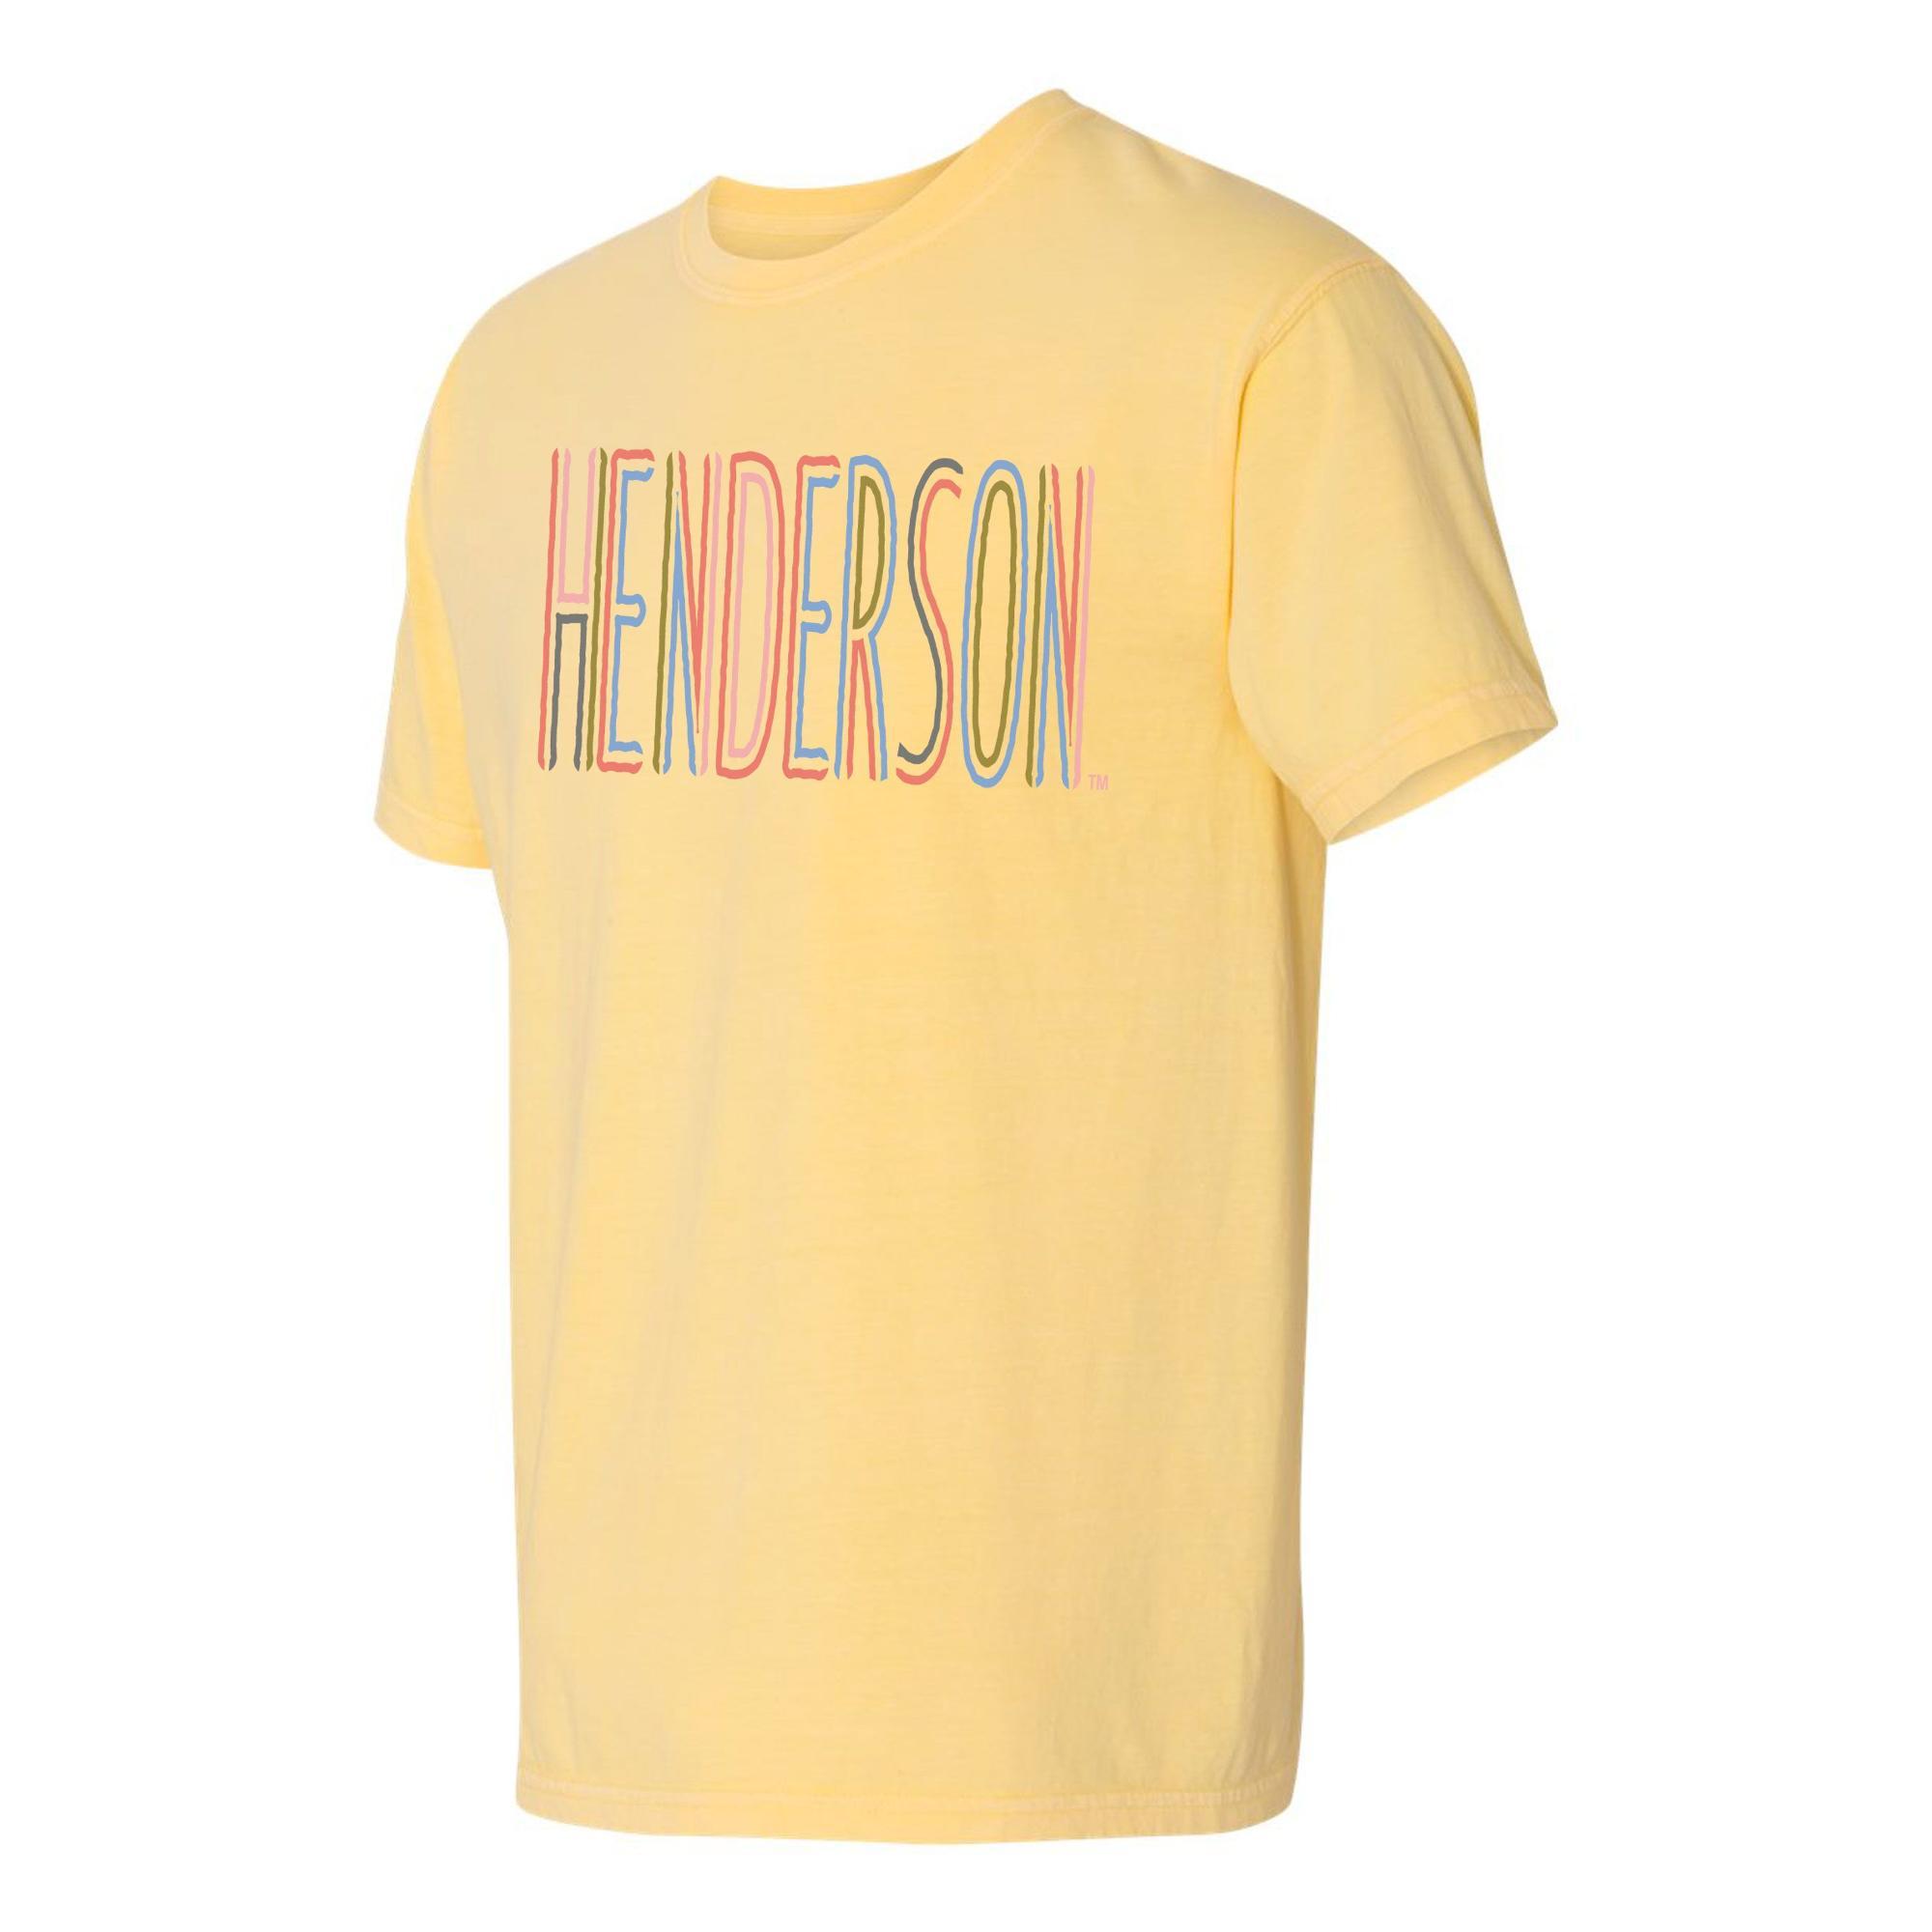 image of: Henderson Comfort Colors Ringspun Short Sleeve T-Shirt